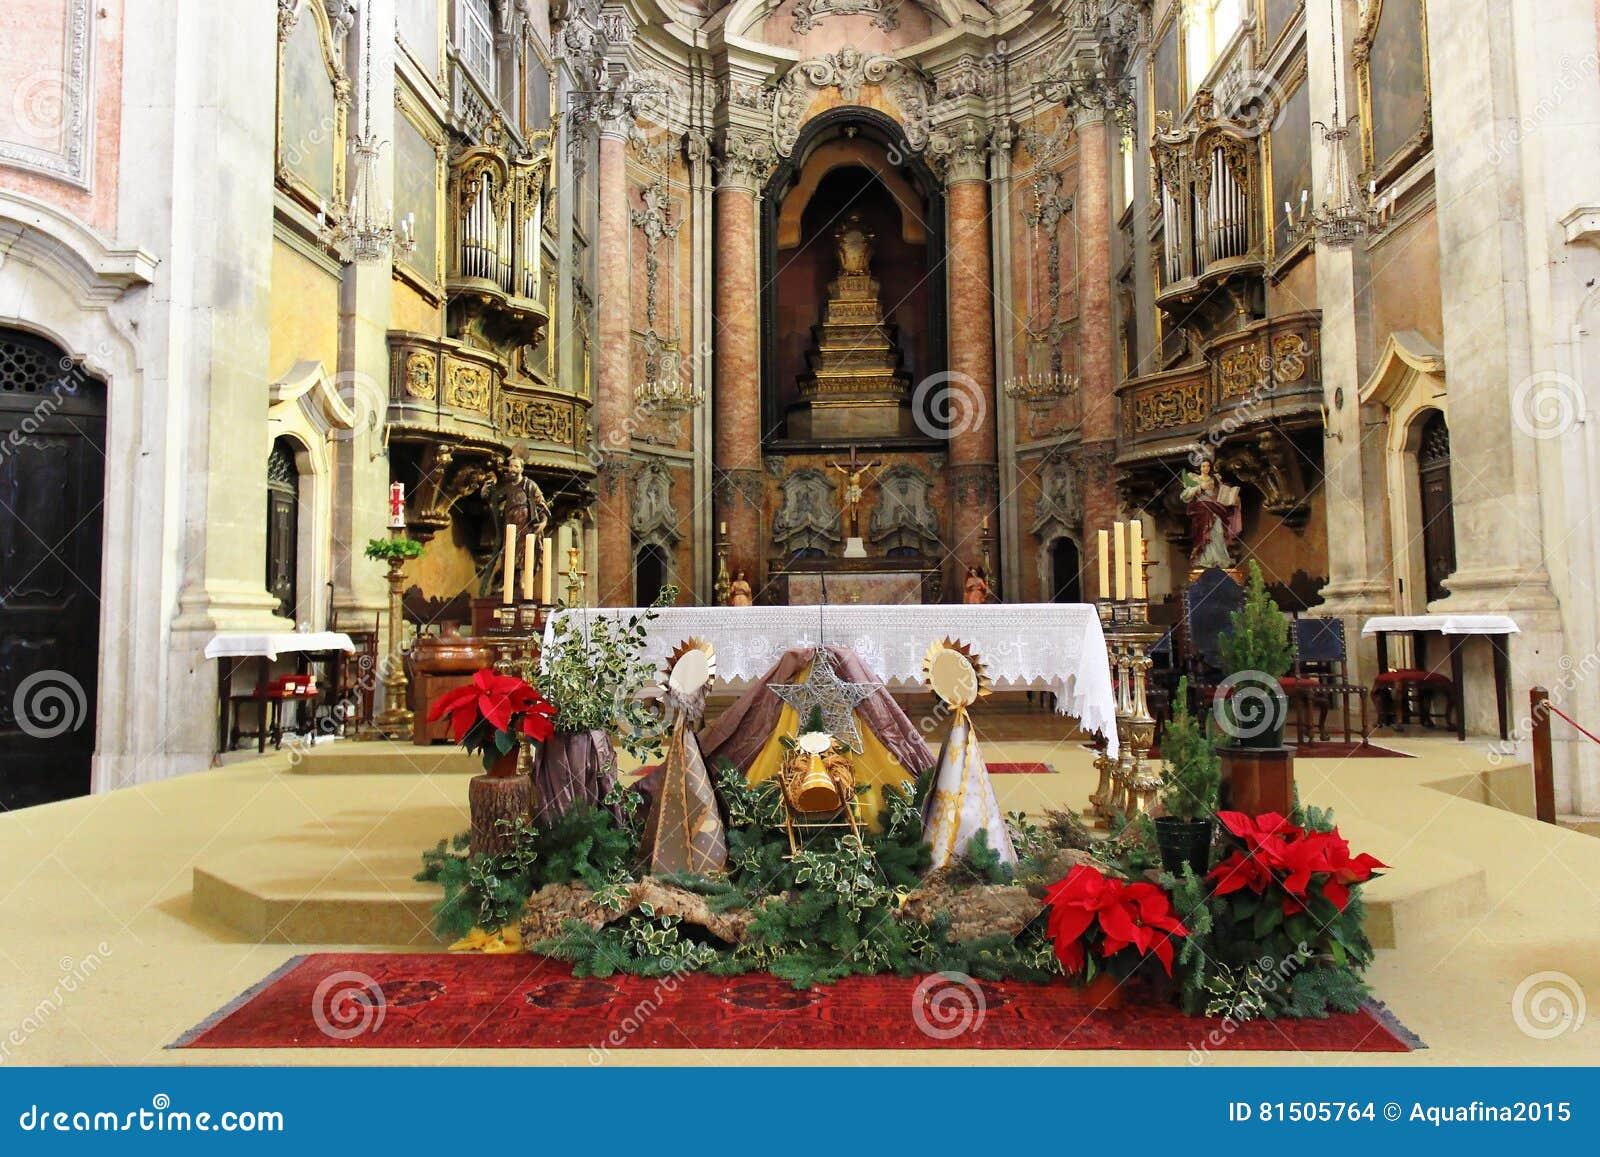 Moderne Weihnachtskrippe.Moderne Weihnachtskrippe Stockfoto Bild Von Jesus Messias 81505764